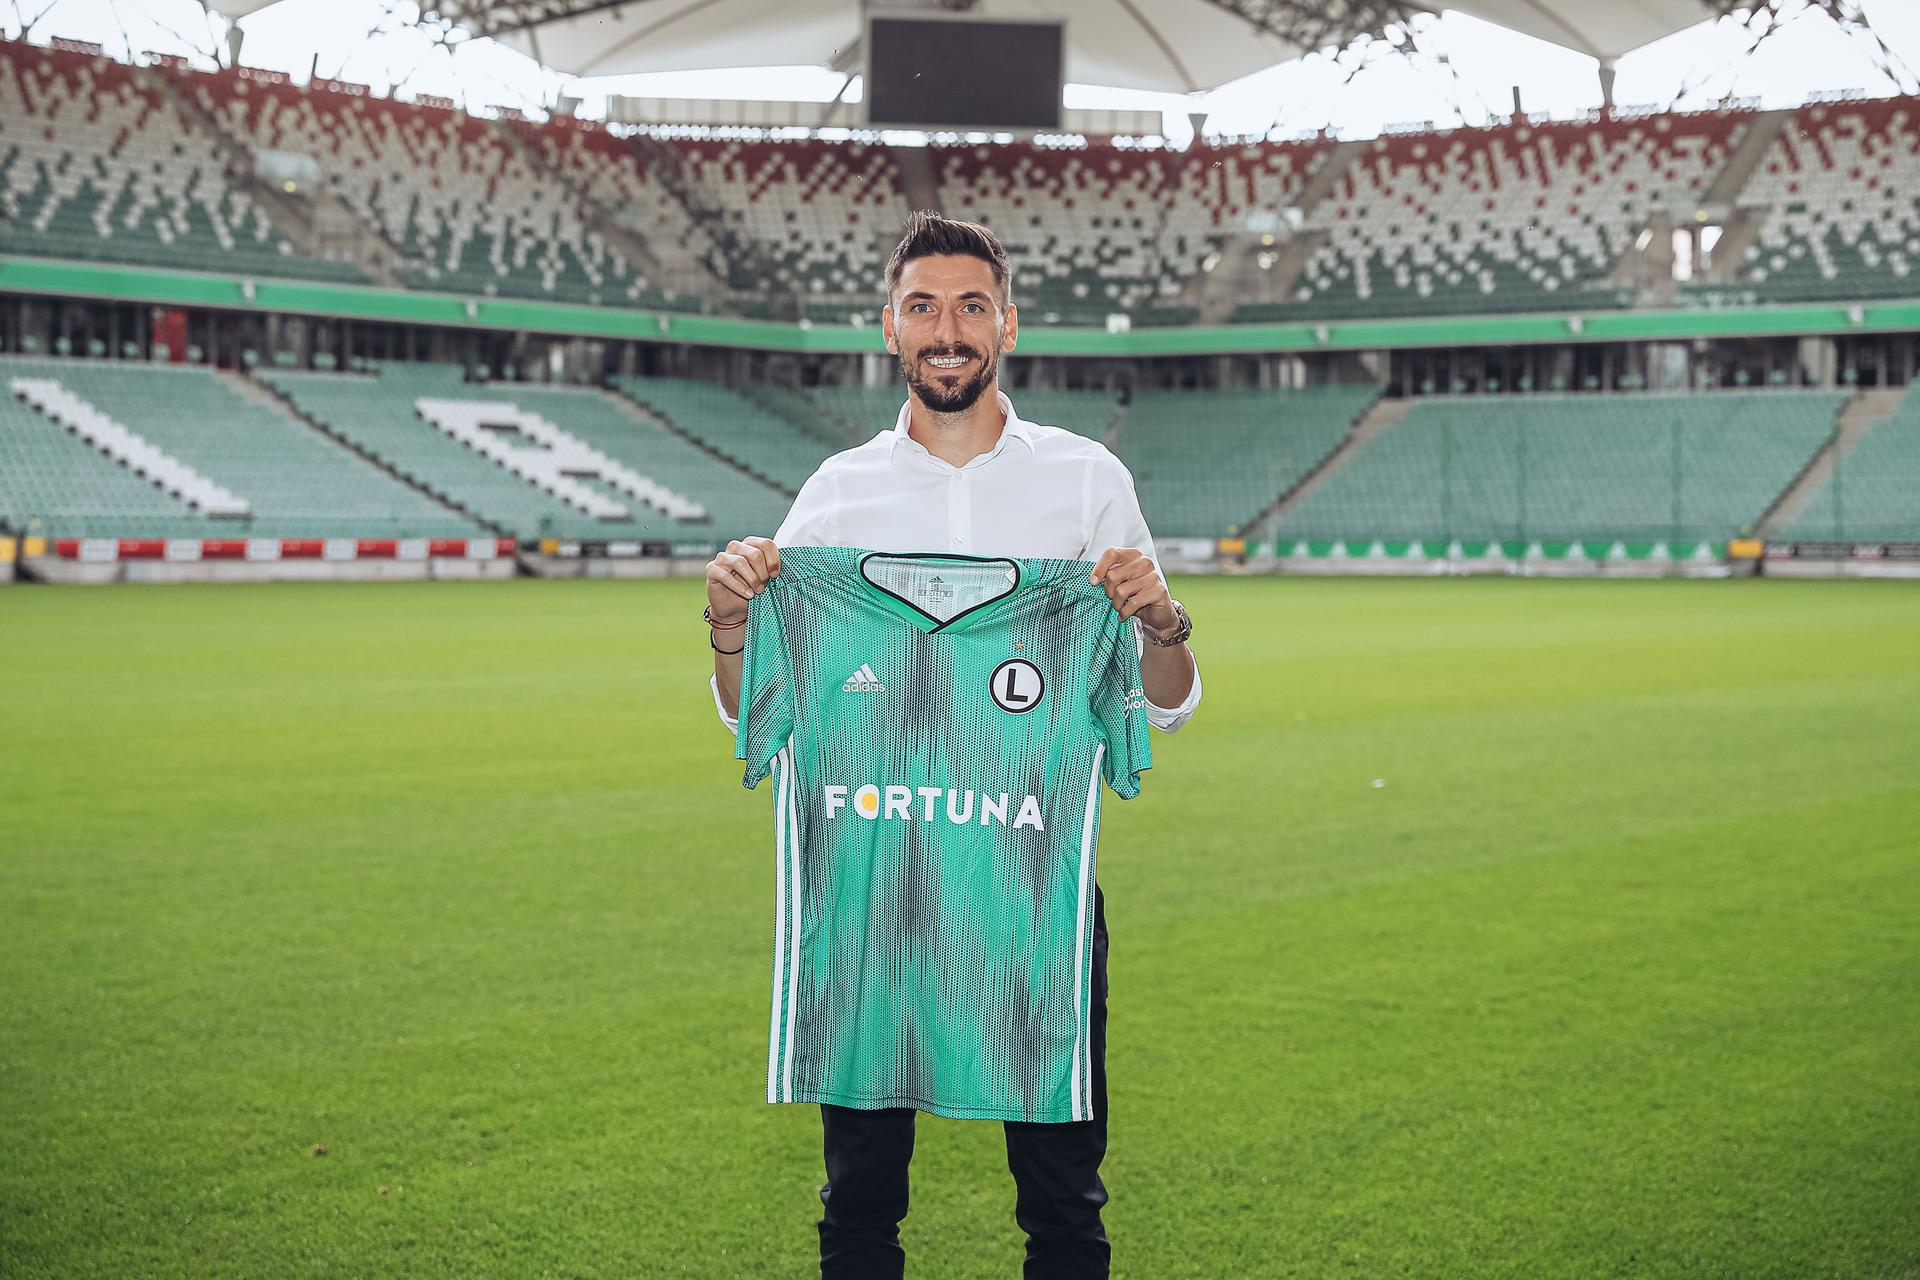 Legia się zbroi na europejskie puchary, ile zarobi Filip Mladenović? - Super Express